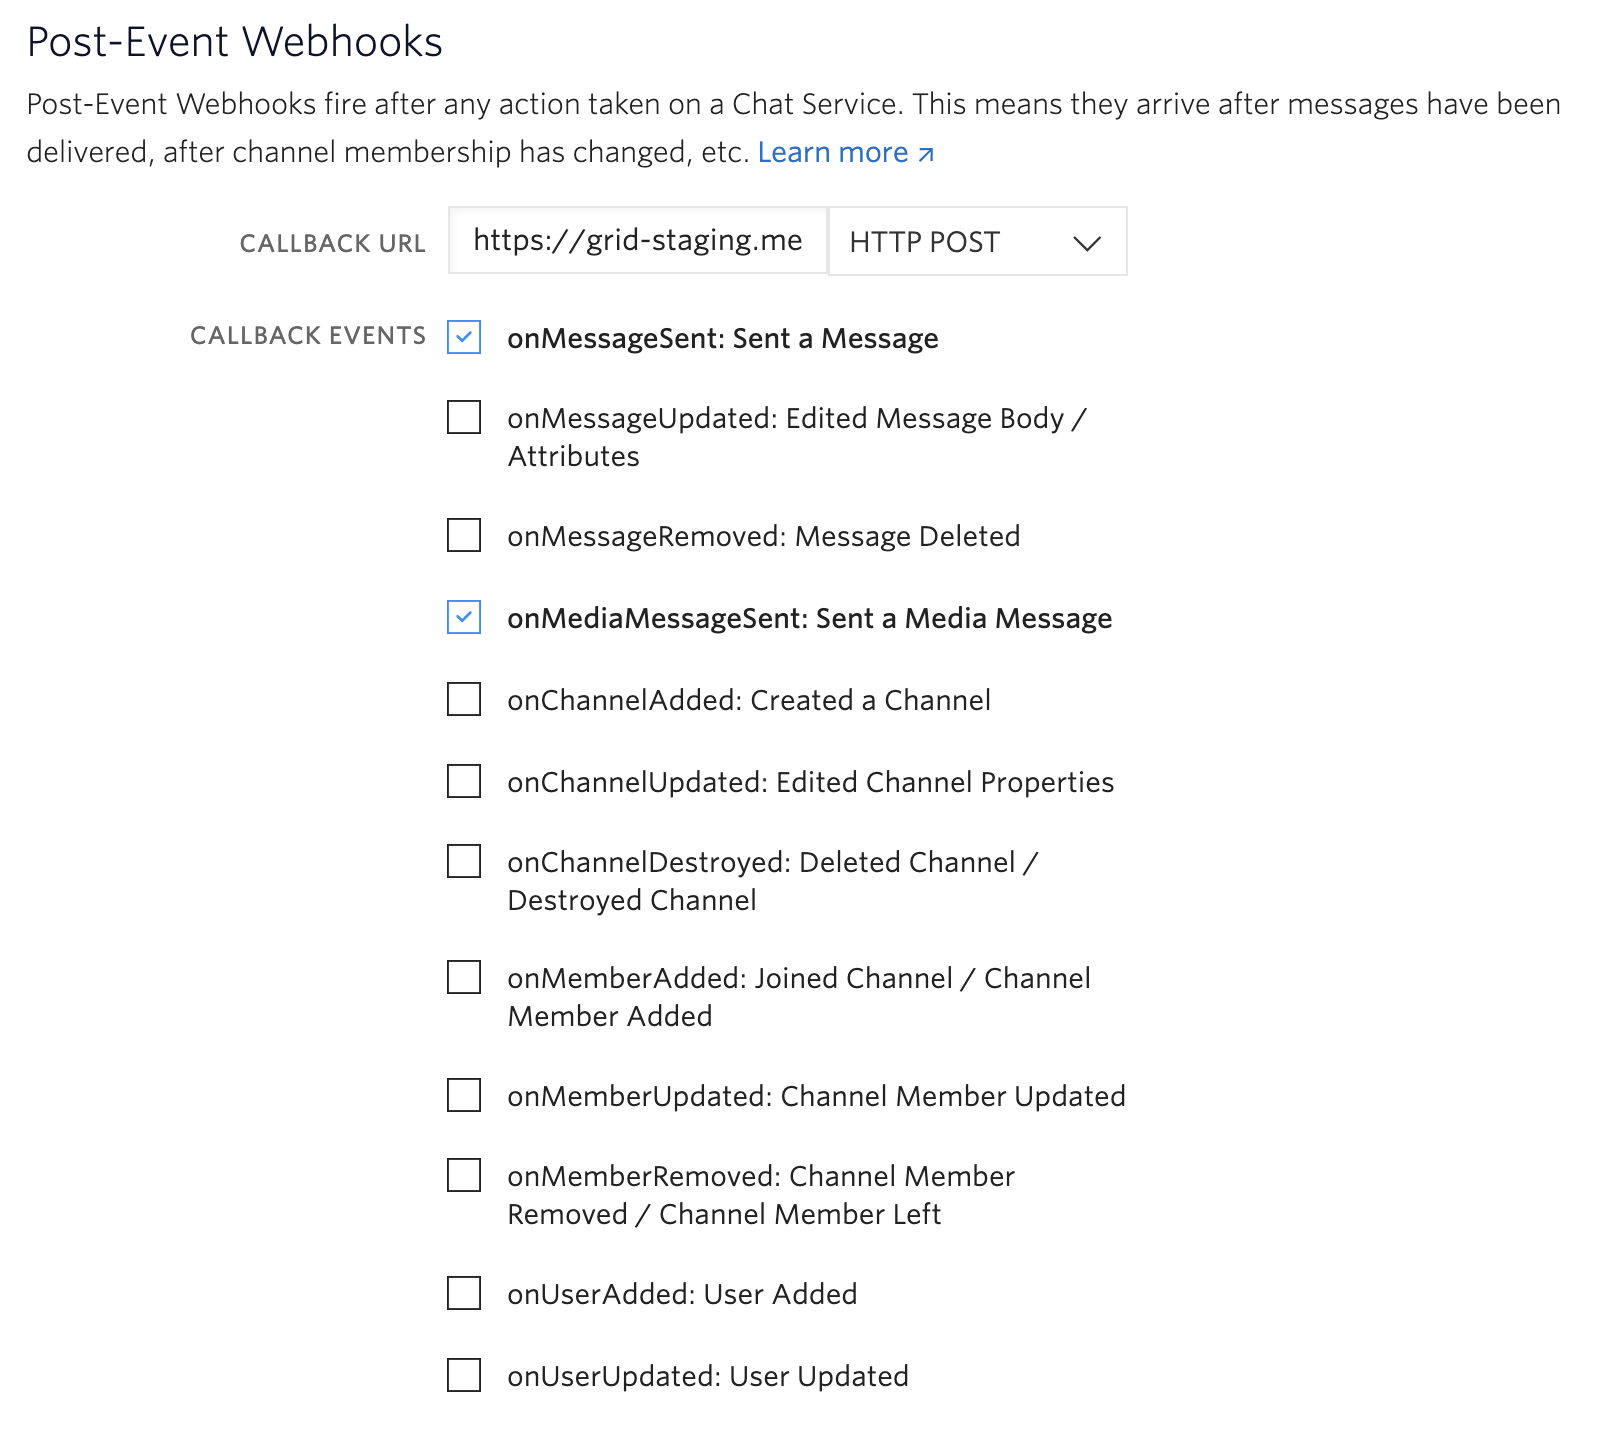 Post-event webhook settings